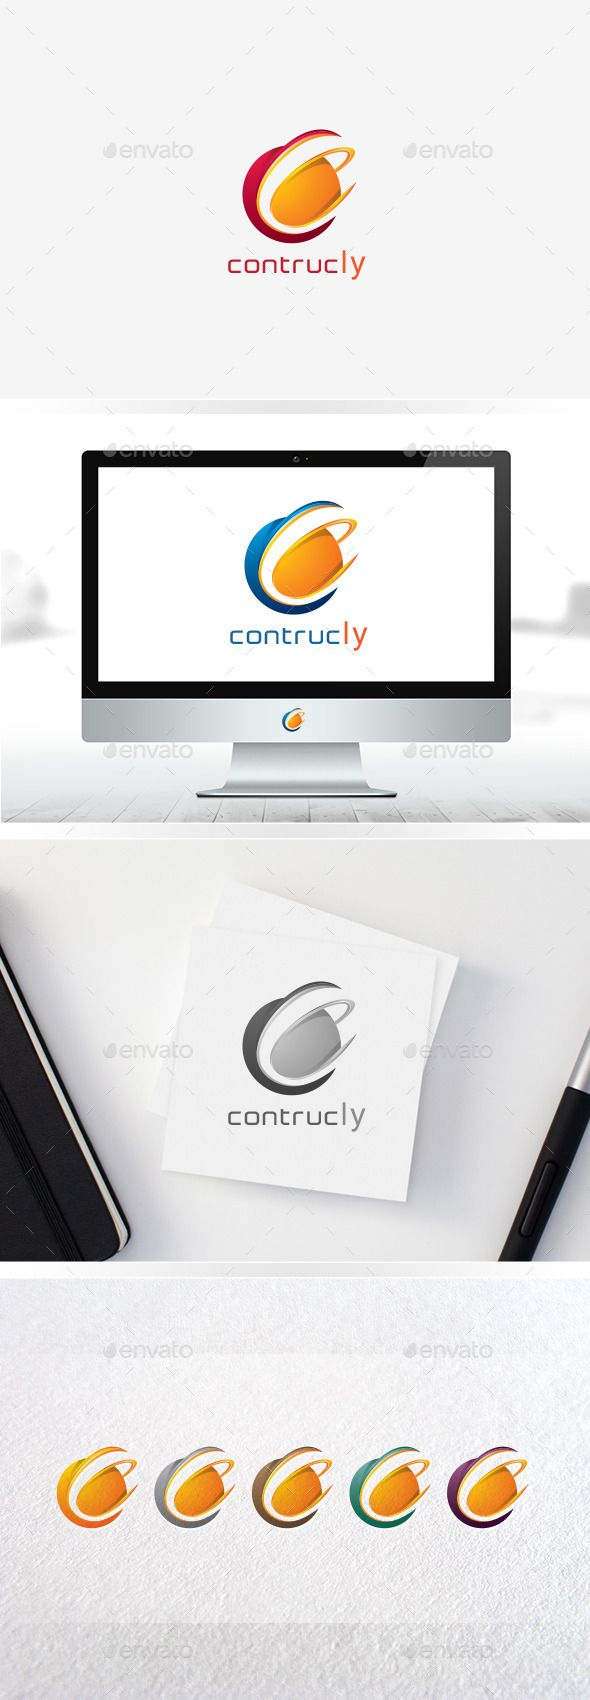 Circle C / Letter C / Logo C / 3D Logo Templates - Logo Templates